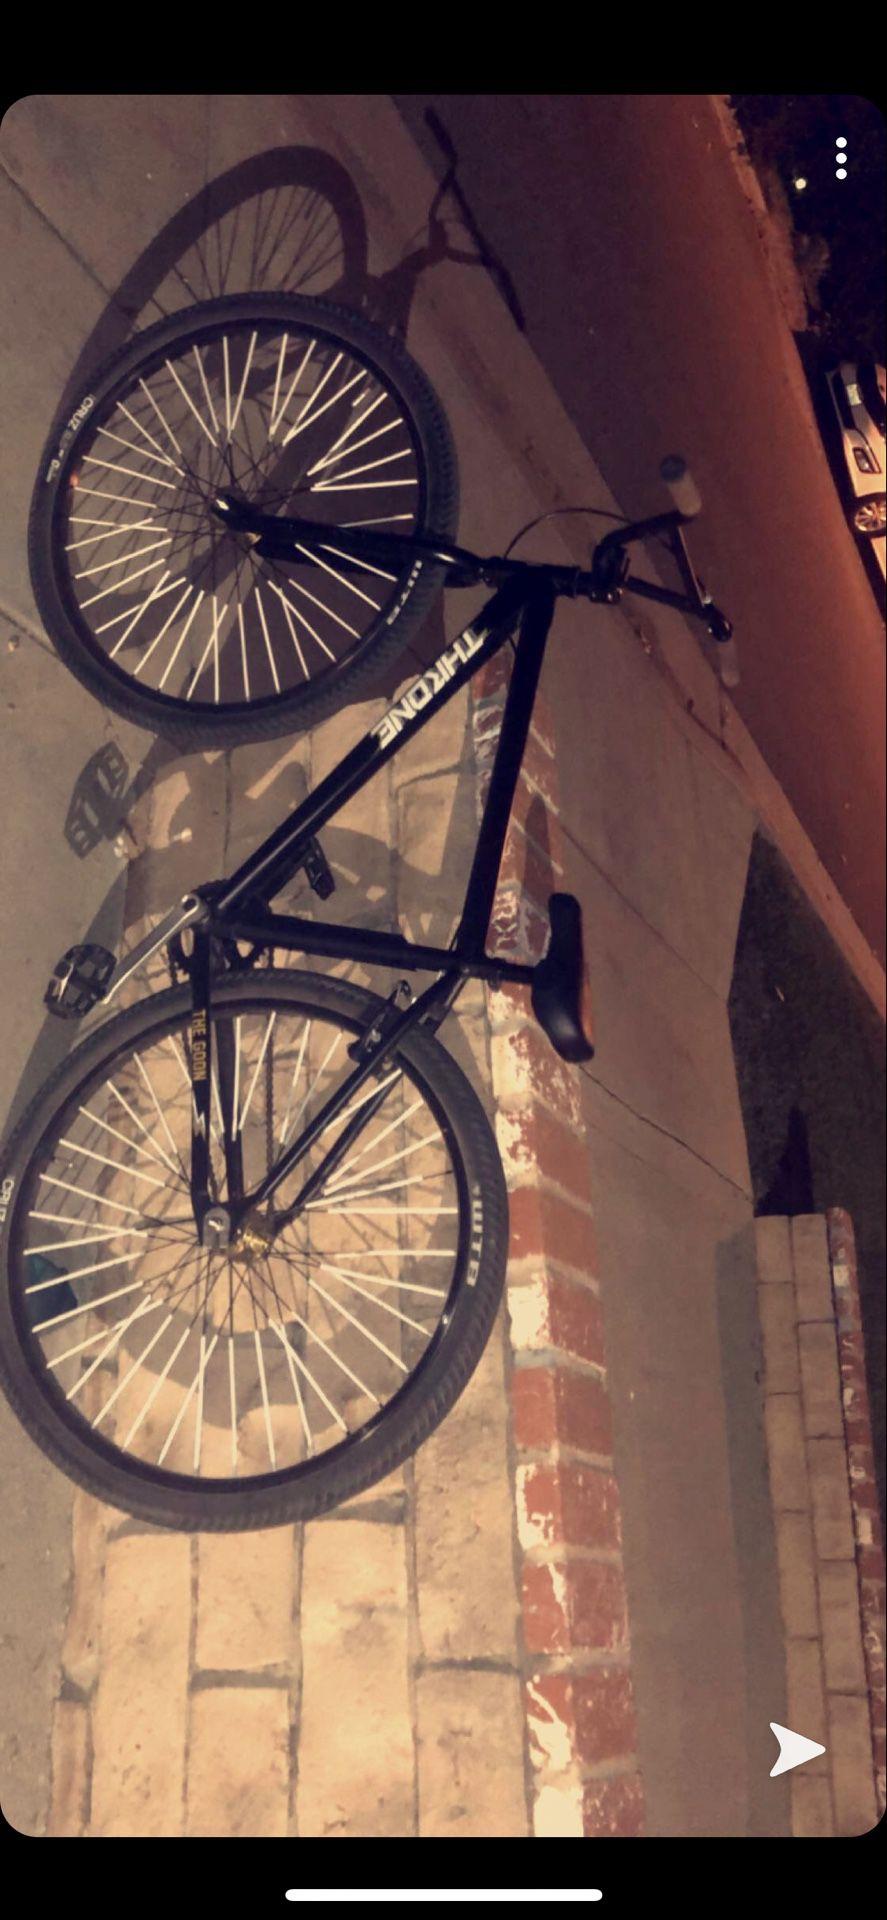 Da goon throne bicycle